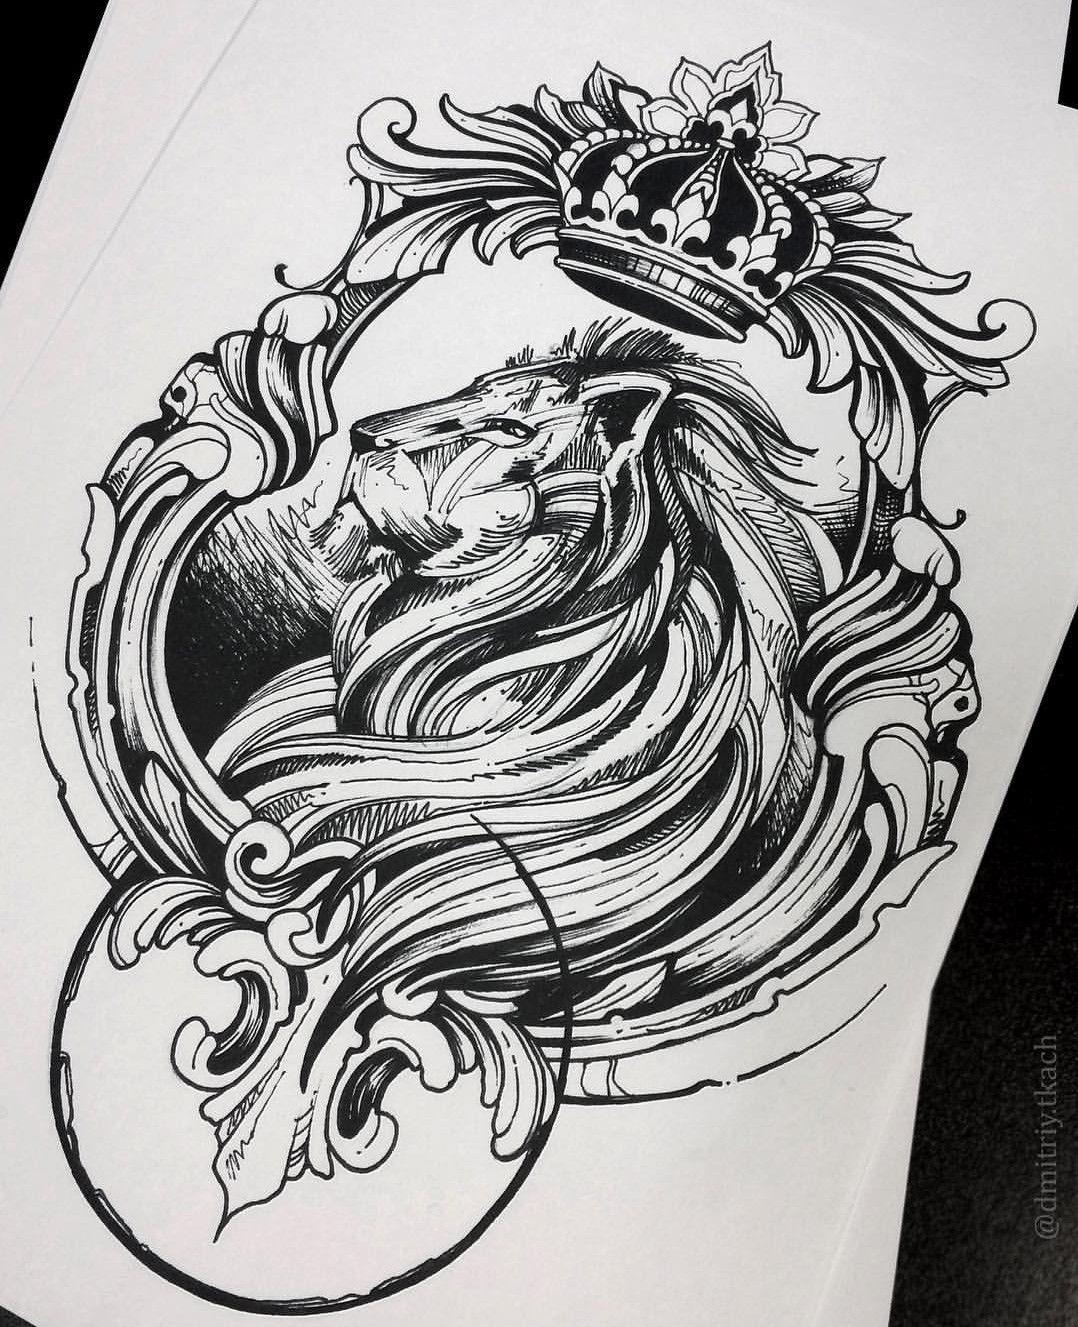 Pin De Fil Vova Em звірі ескізи Desenho Tatuagem Desenhos